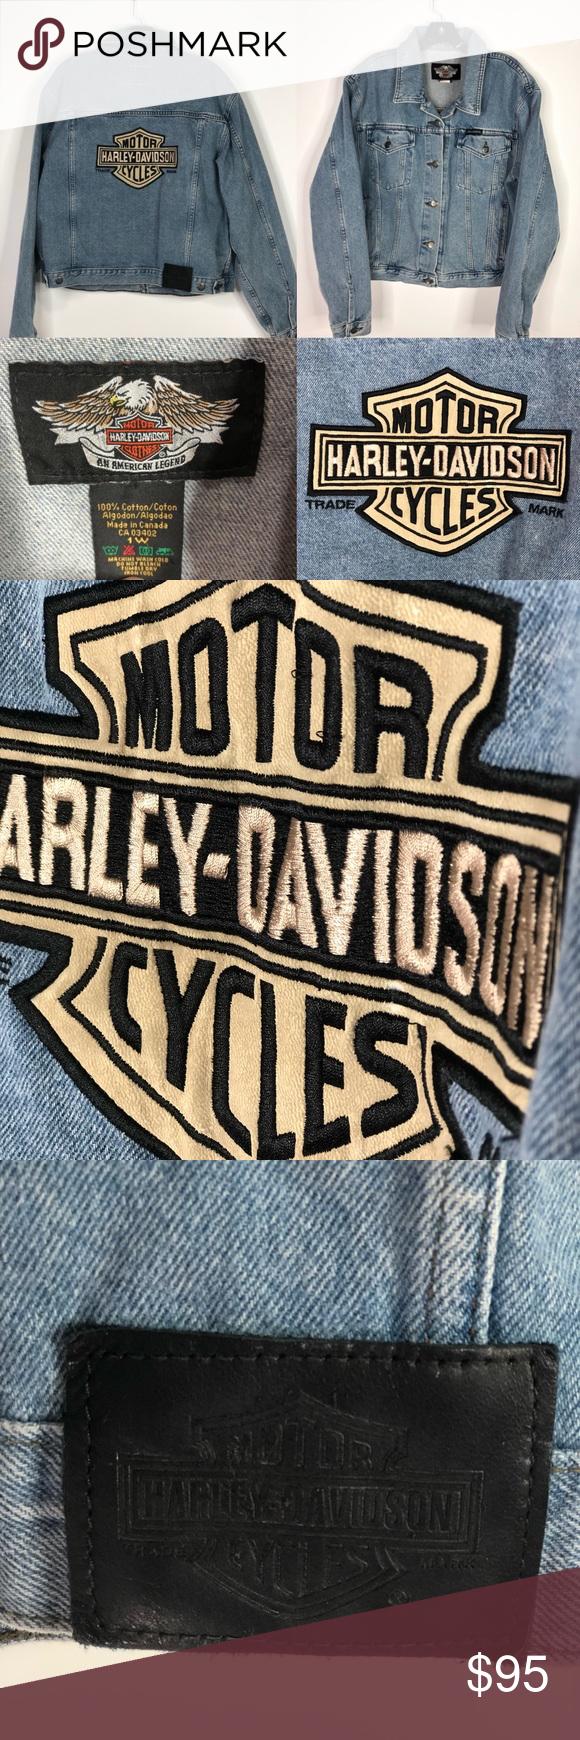 Harley Davidson Vintage Denim Jean Jacket Size 1w Women S Plus